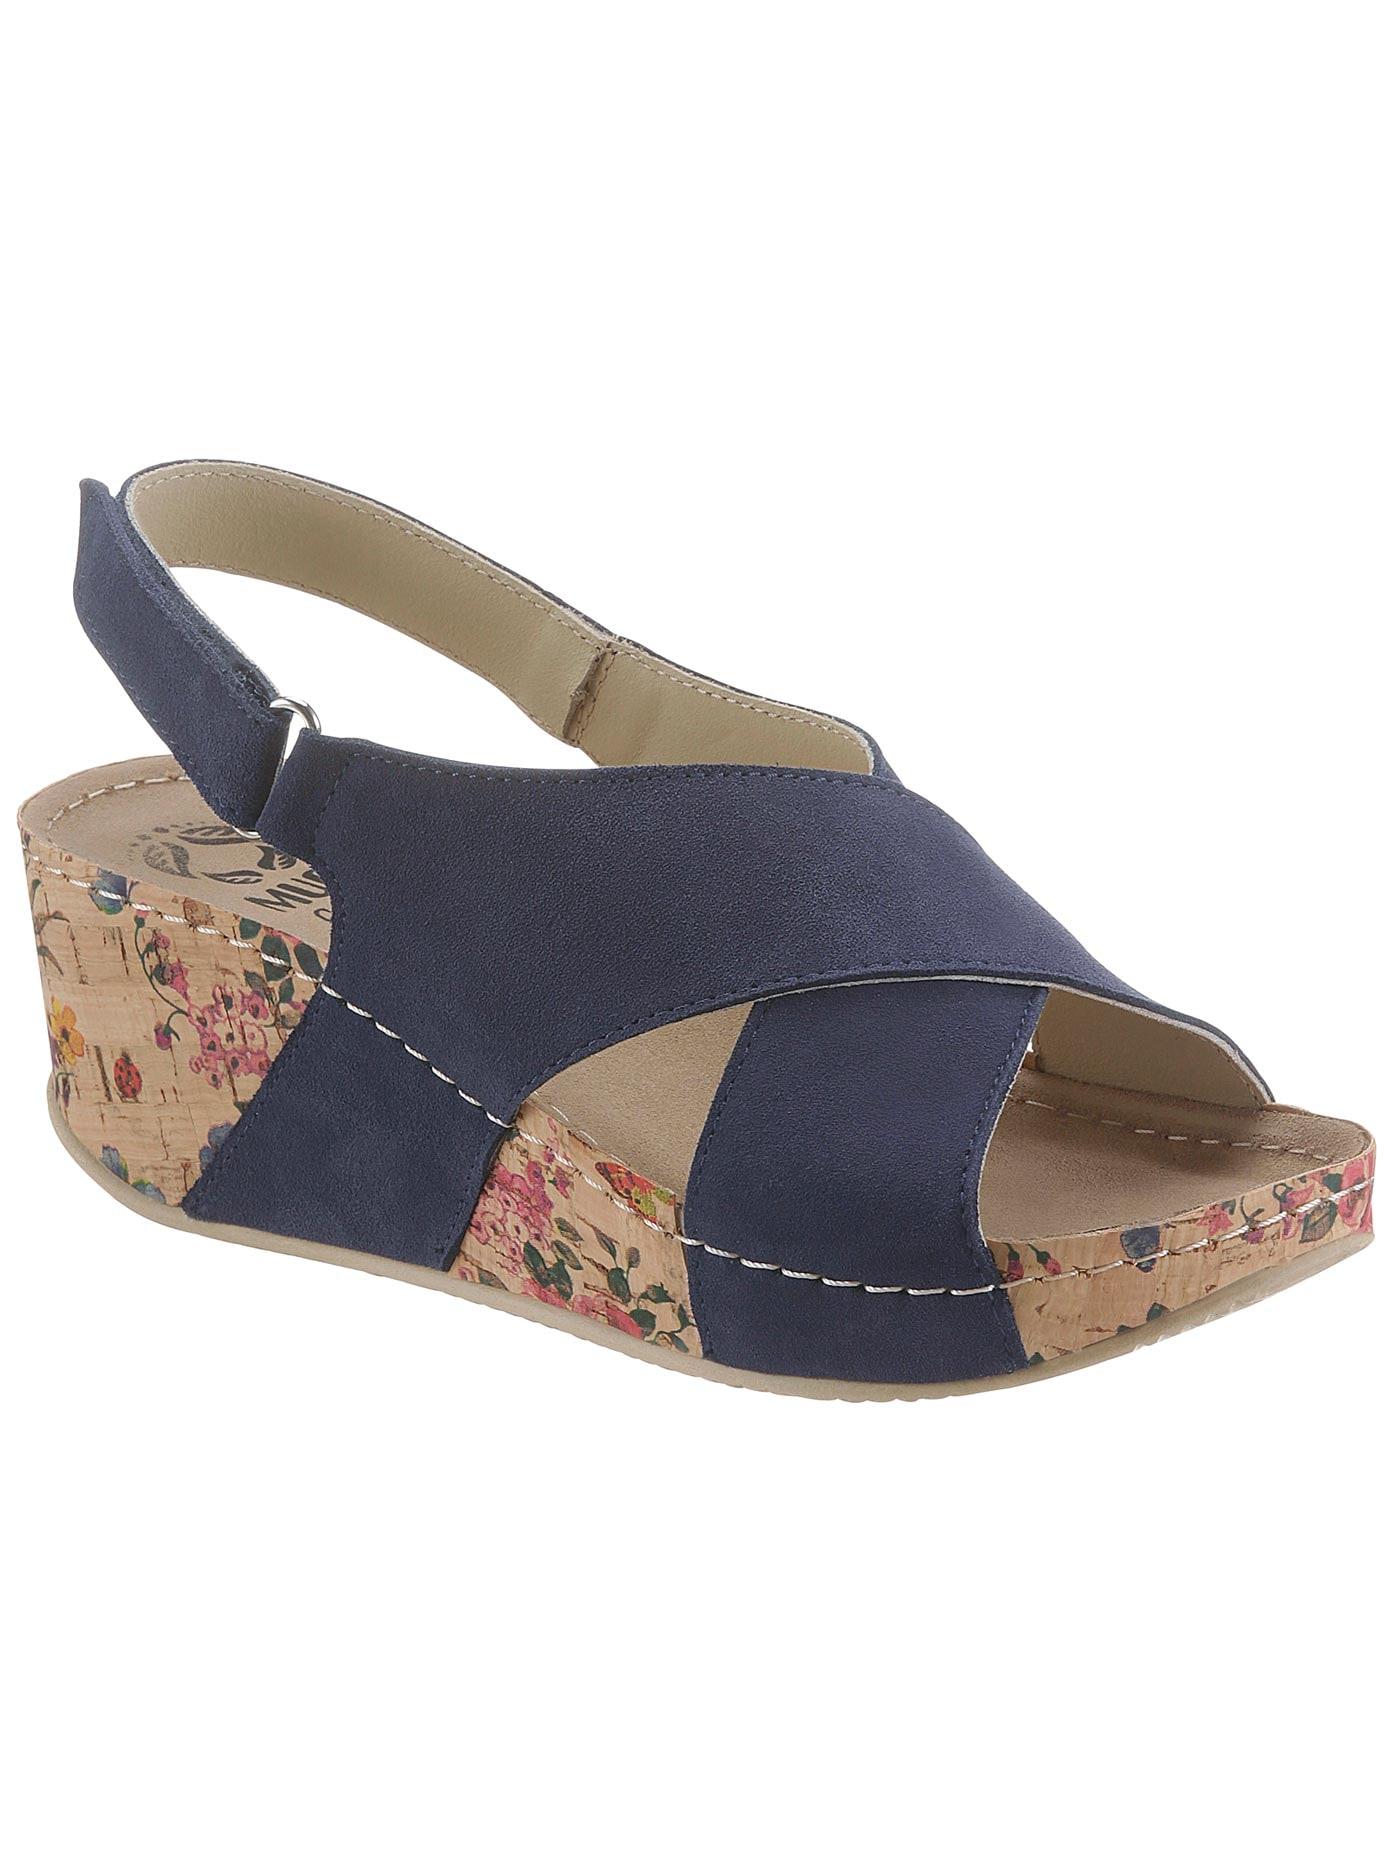 MUBB Sandalette blau Damen Sandaletten Sandalen